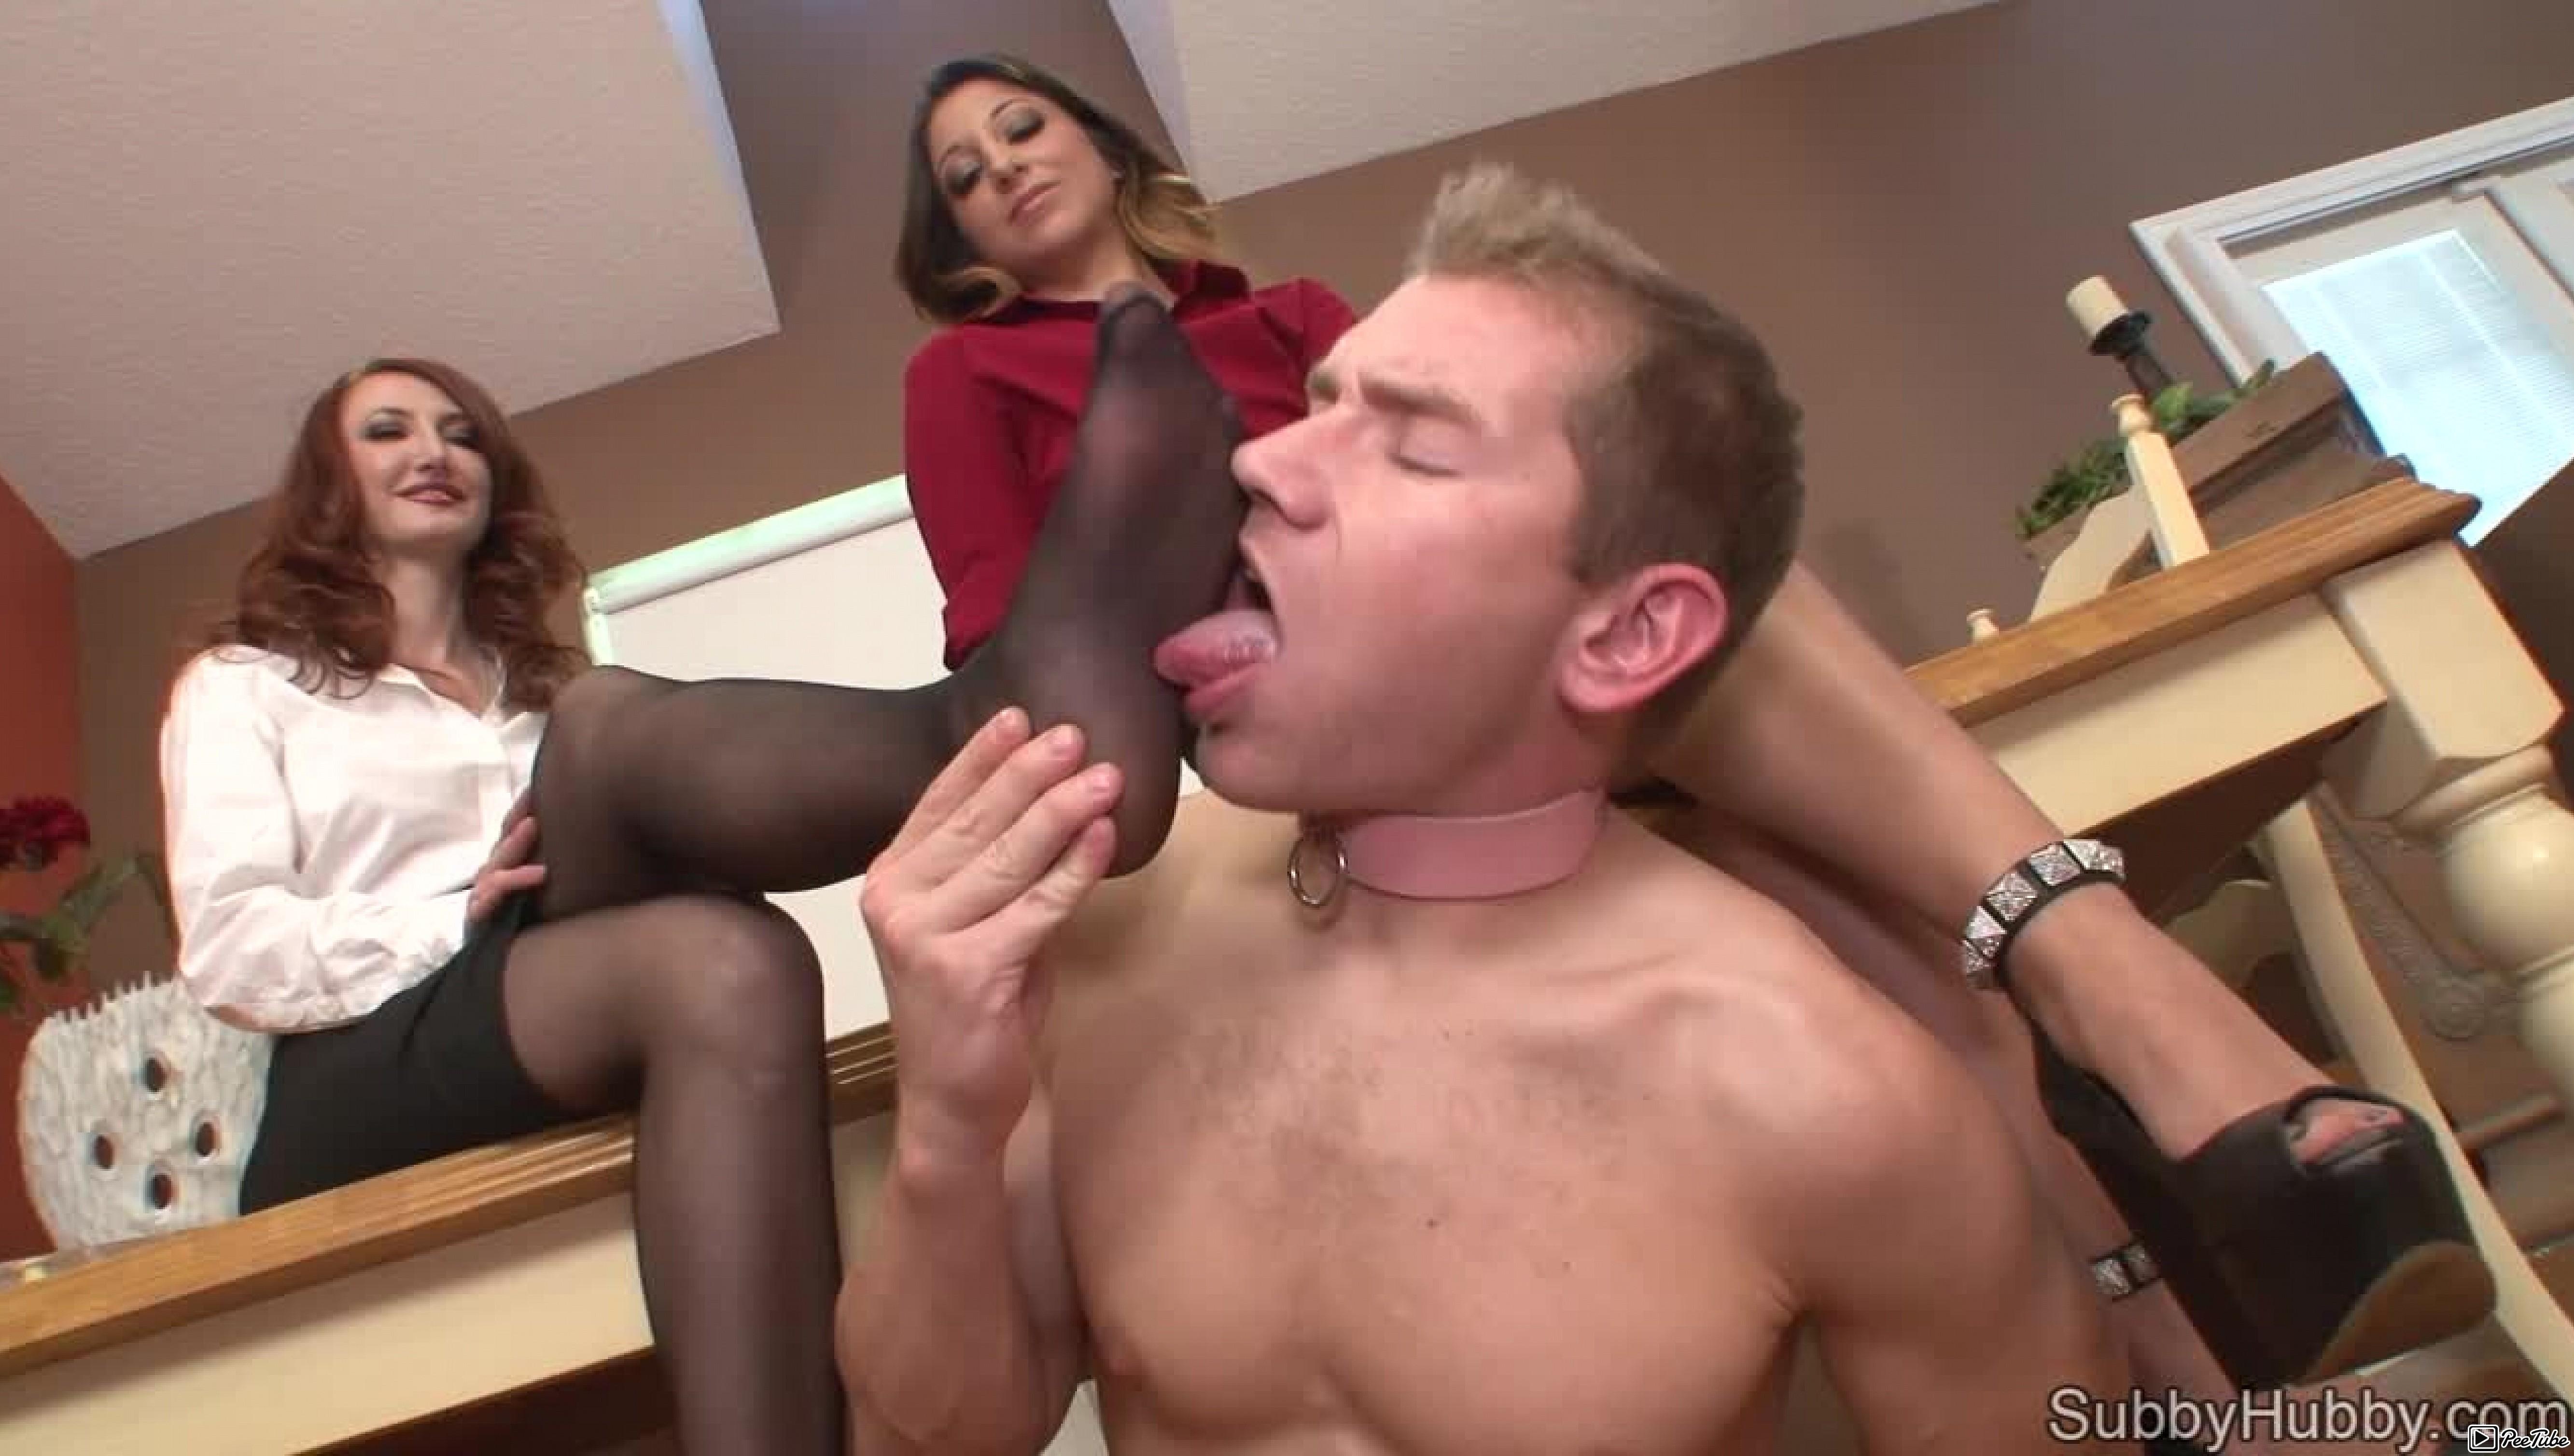 Subbyhubby.com – Cuckold Foot Slut Kendra James 2014 Feet Cuckold